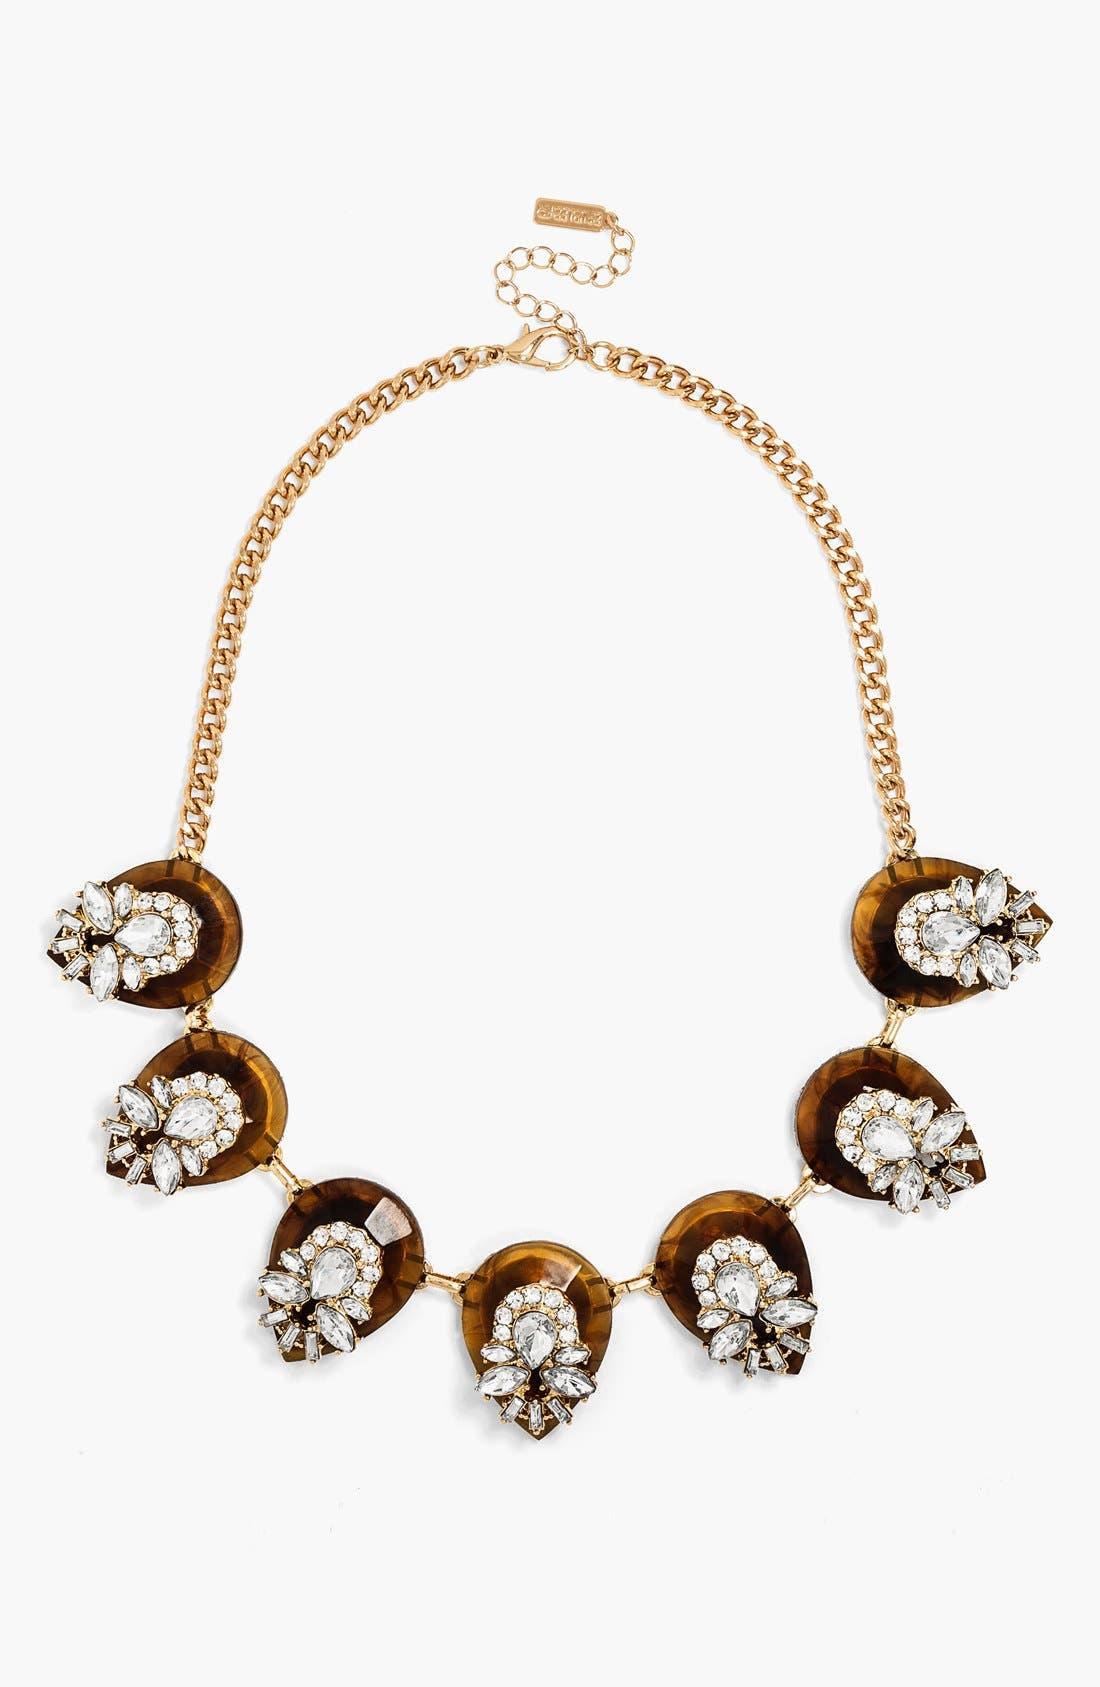 Main Image - BaubleBar 'Clear Elizabeth' Collar Necklace